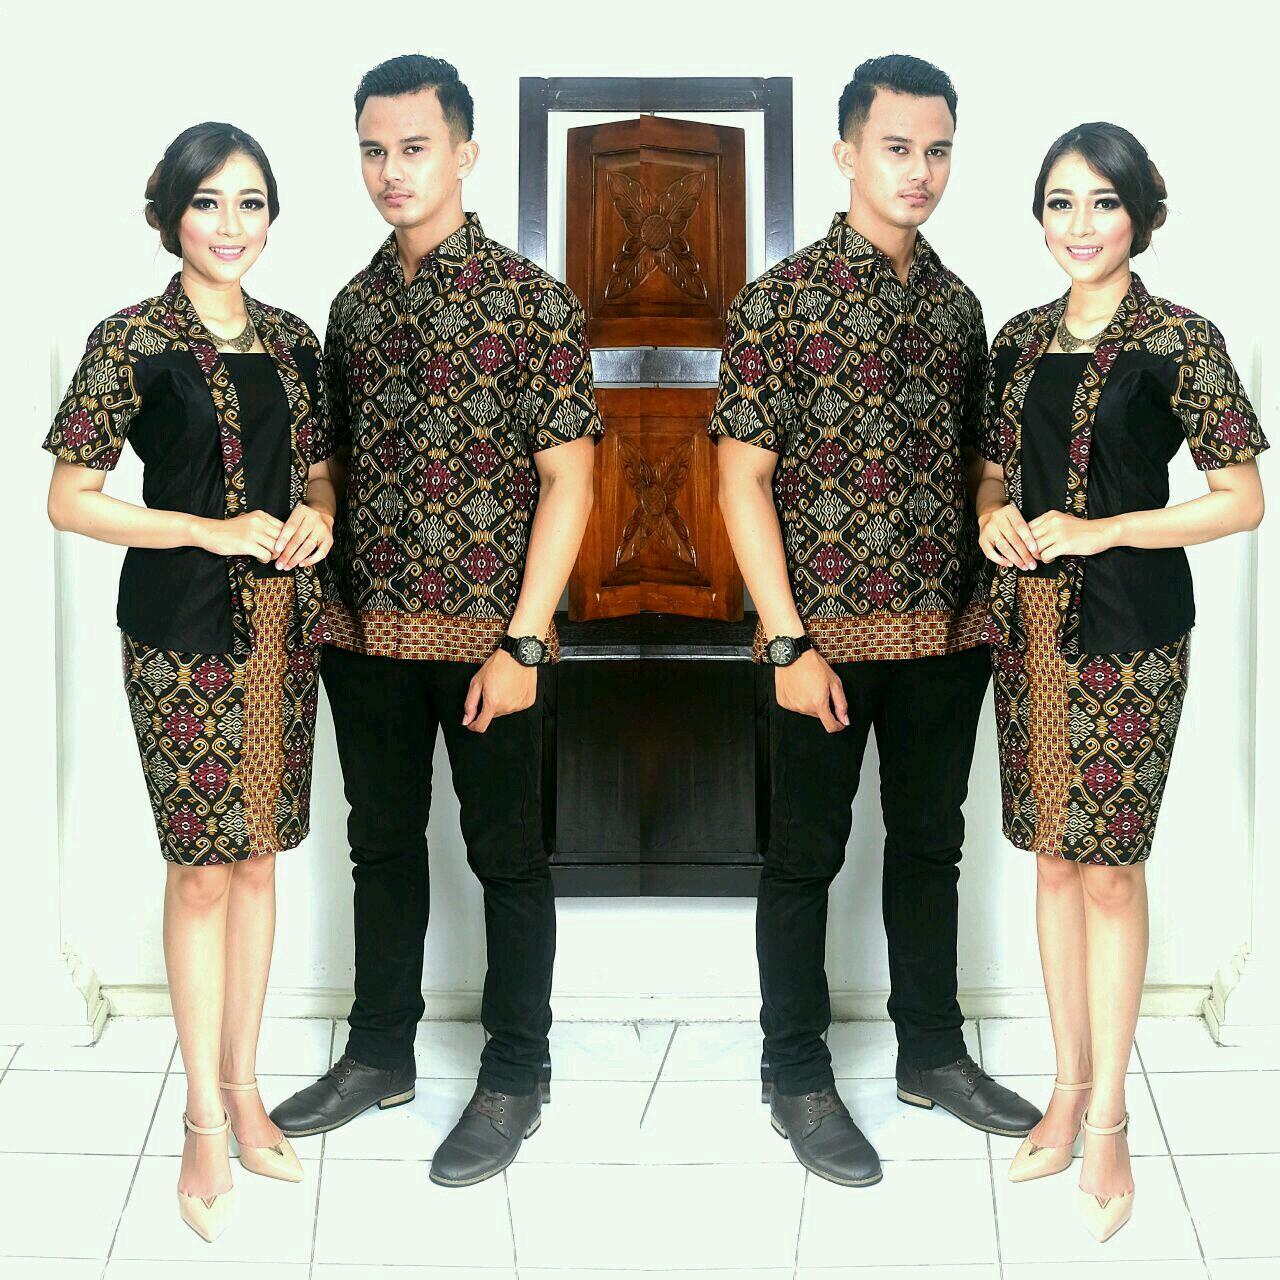 Jual couple kutubaru. Rp 215.000. YayaBatik.com Toko Batik Solo Online 161c2ddd8a